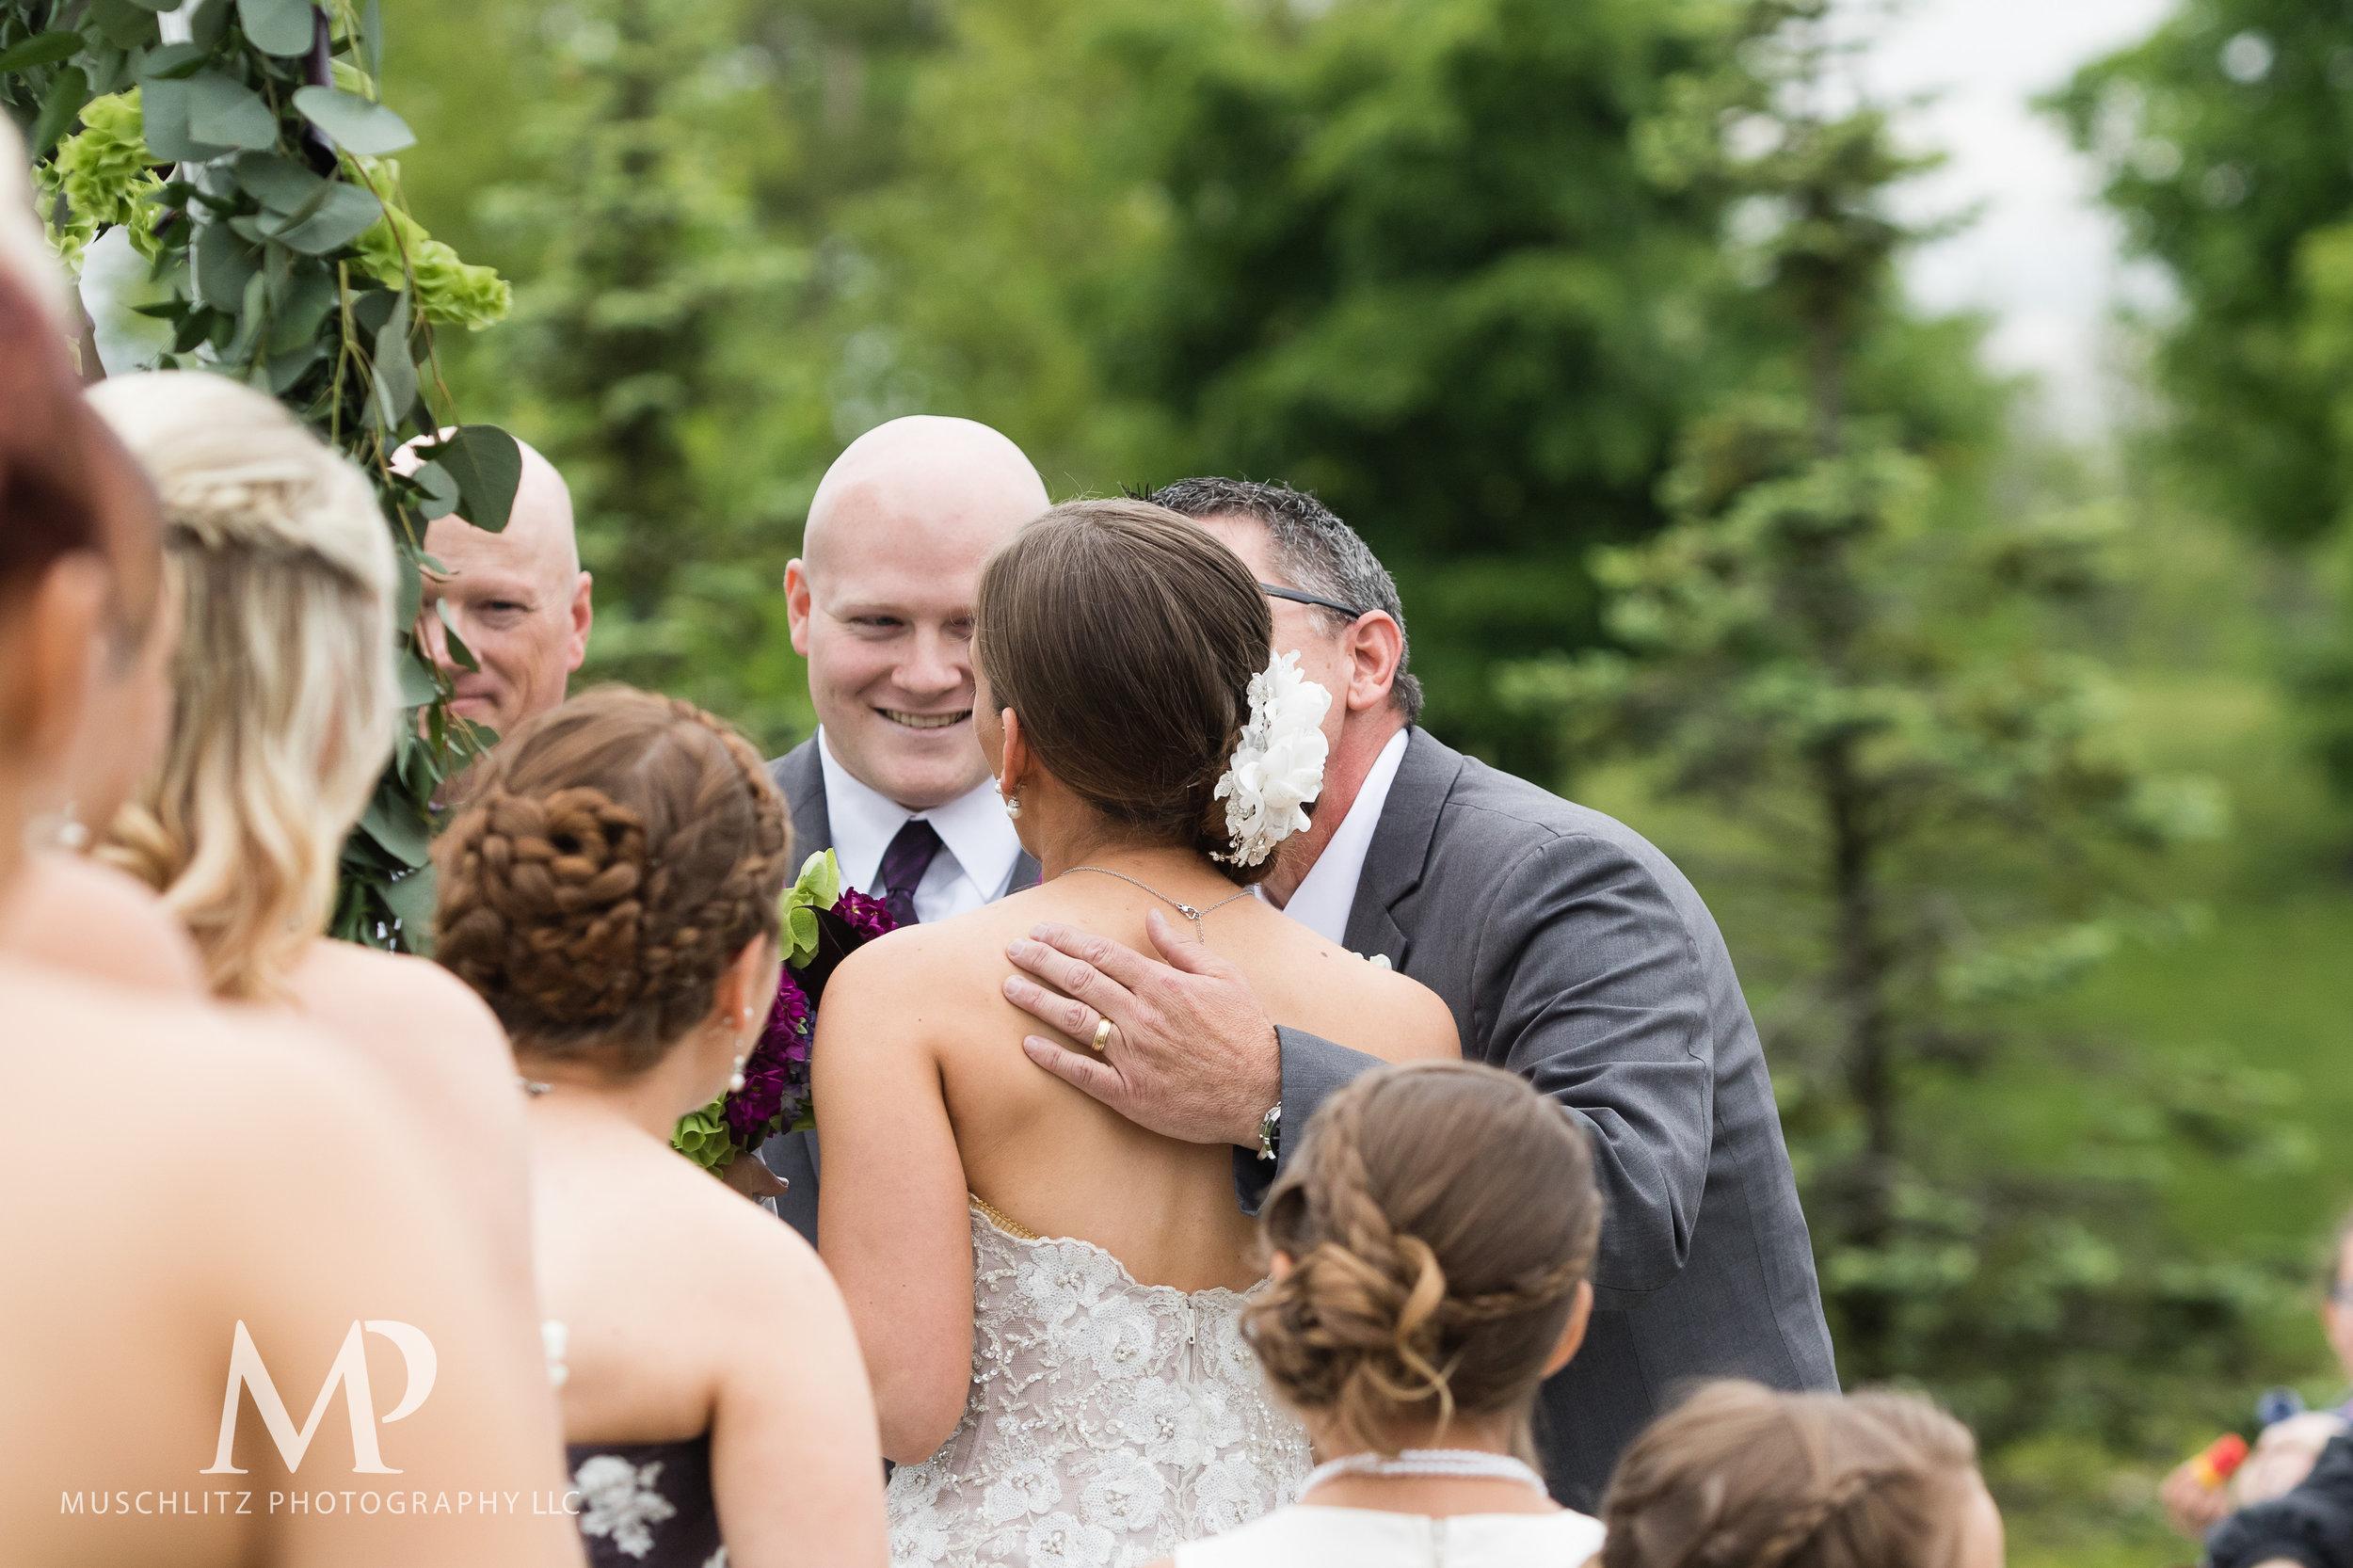 club-at-corazon-wedding-ceremony-reception-columbus-dublin-ohio-ohio-university-theme-031.JPG